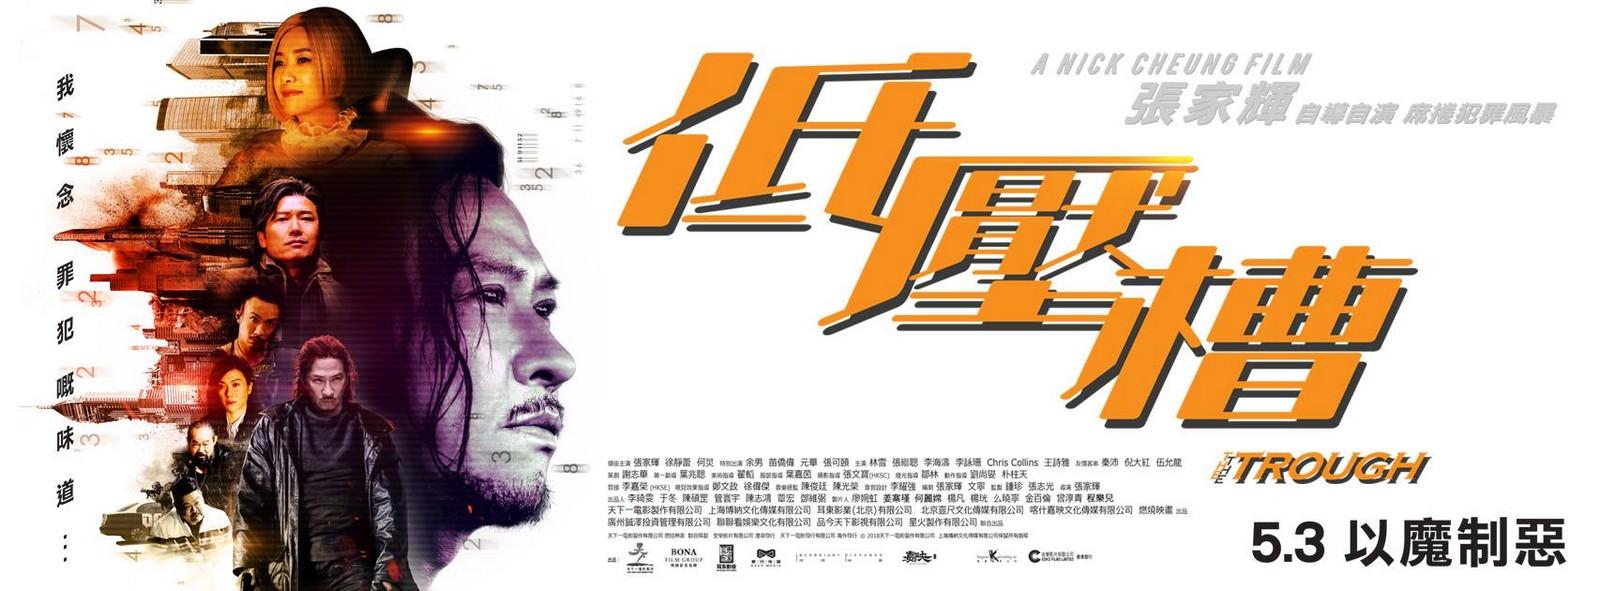 Movie, 低壓槽(中國.香港) / 低壓槽(台.港) / 低压槽:欲望之城(中) / The Trough(英文), 電影海報, 香港, 橫版